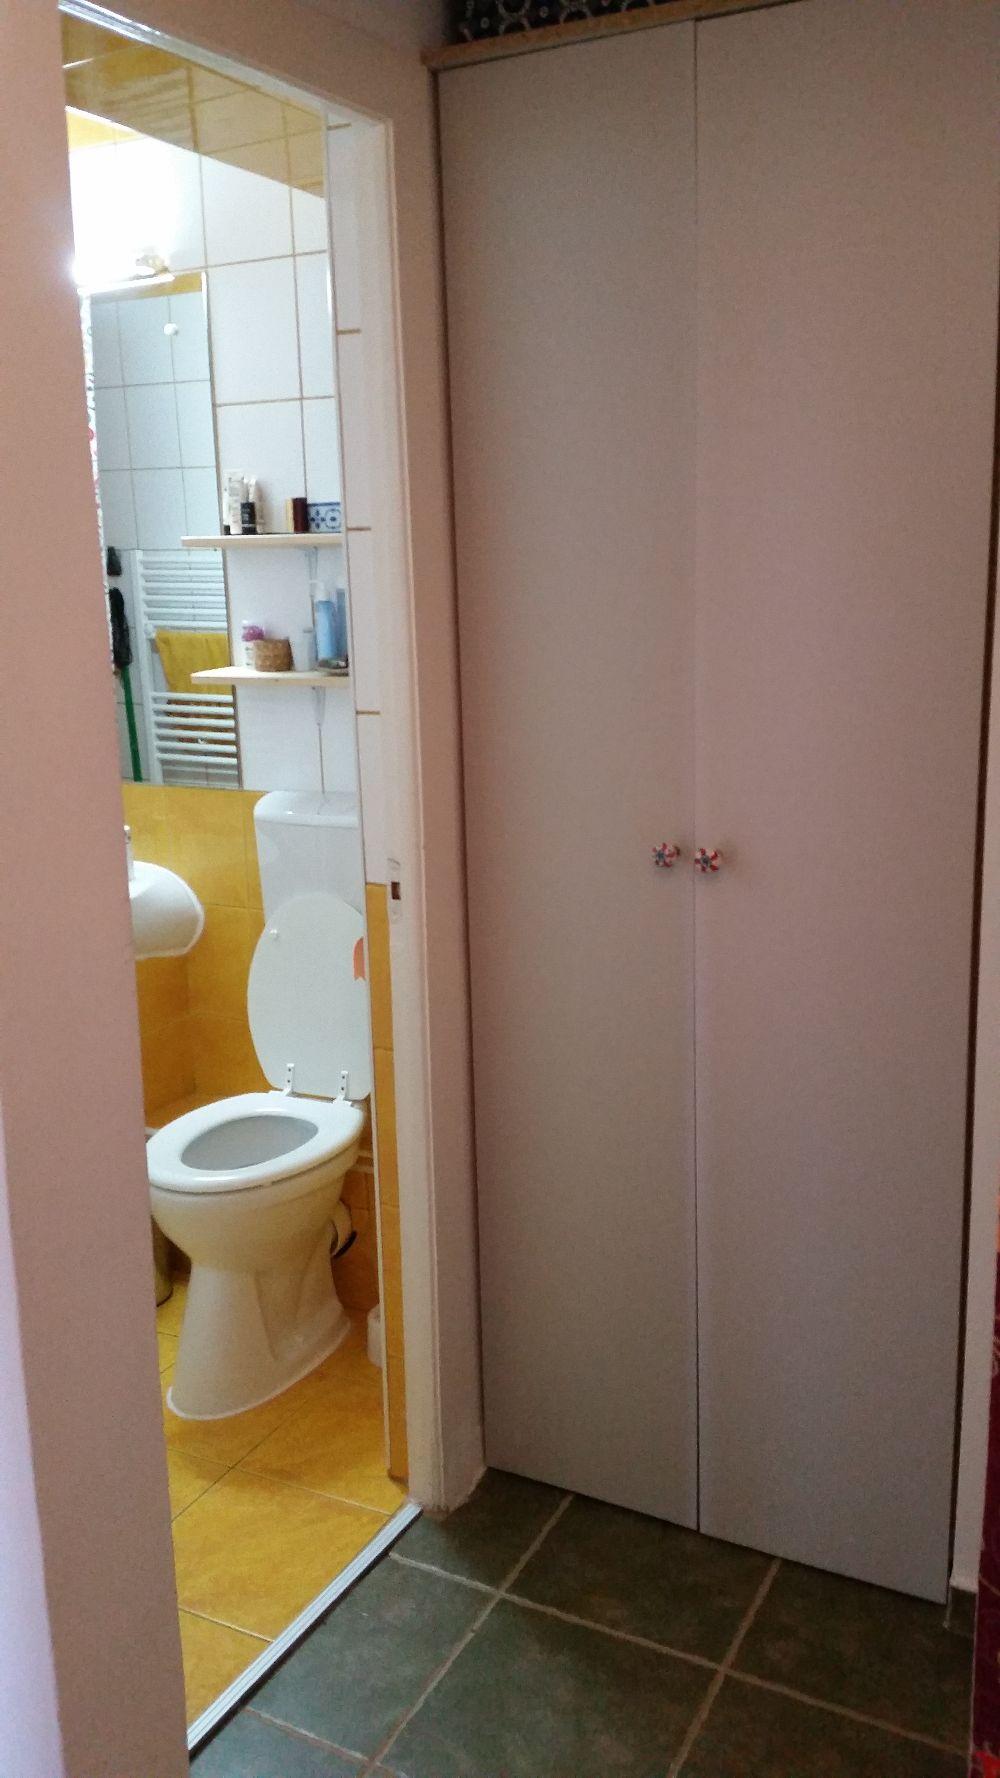 adelaparvu.com despre apartament 3 camere colorat in Sibiu, Foto Adela Parvu (5)